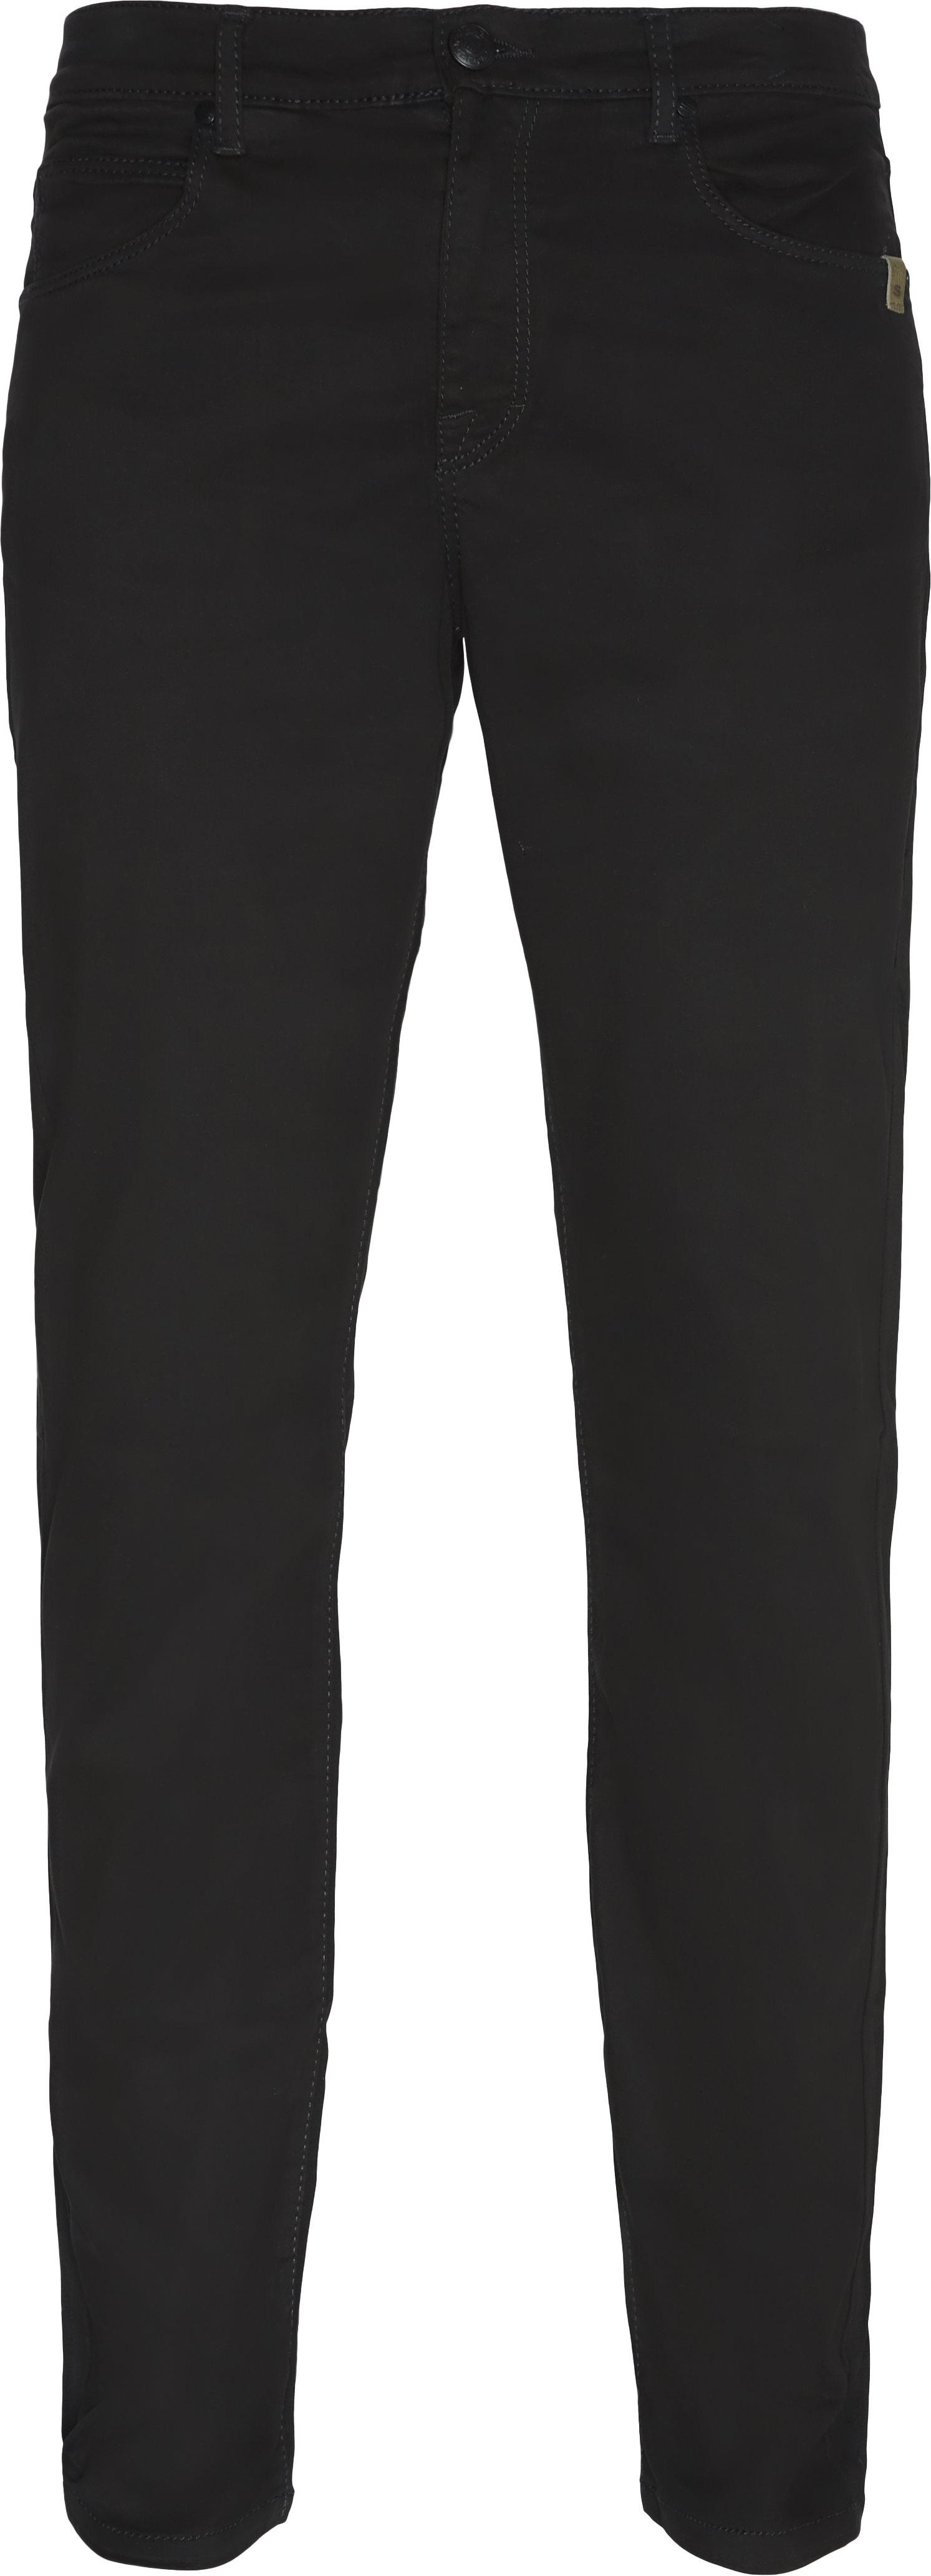 Sand Jeans - Regular - Grön - stl W36